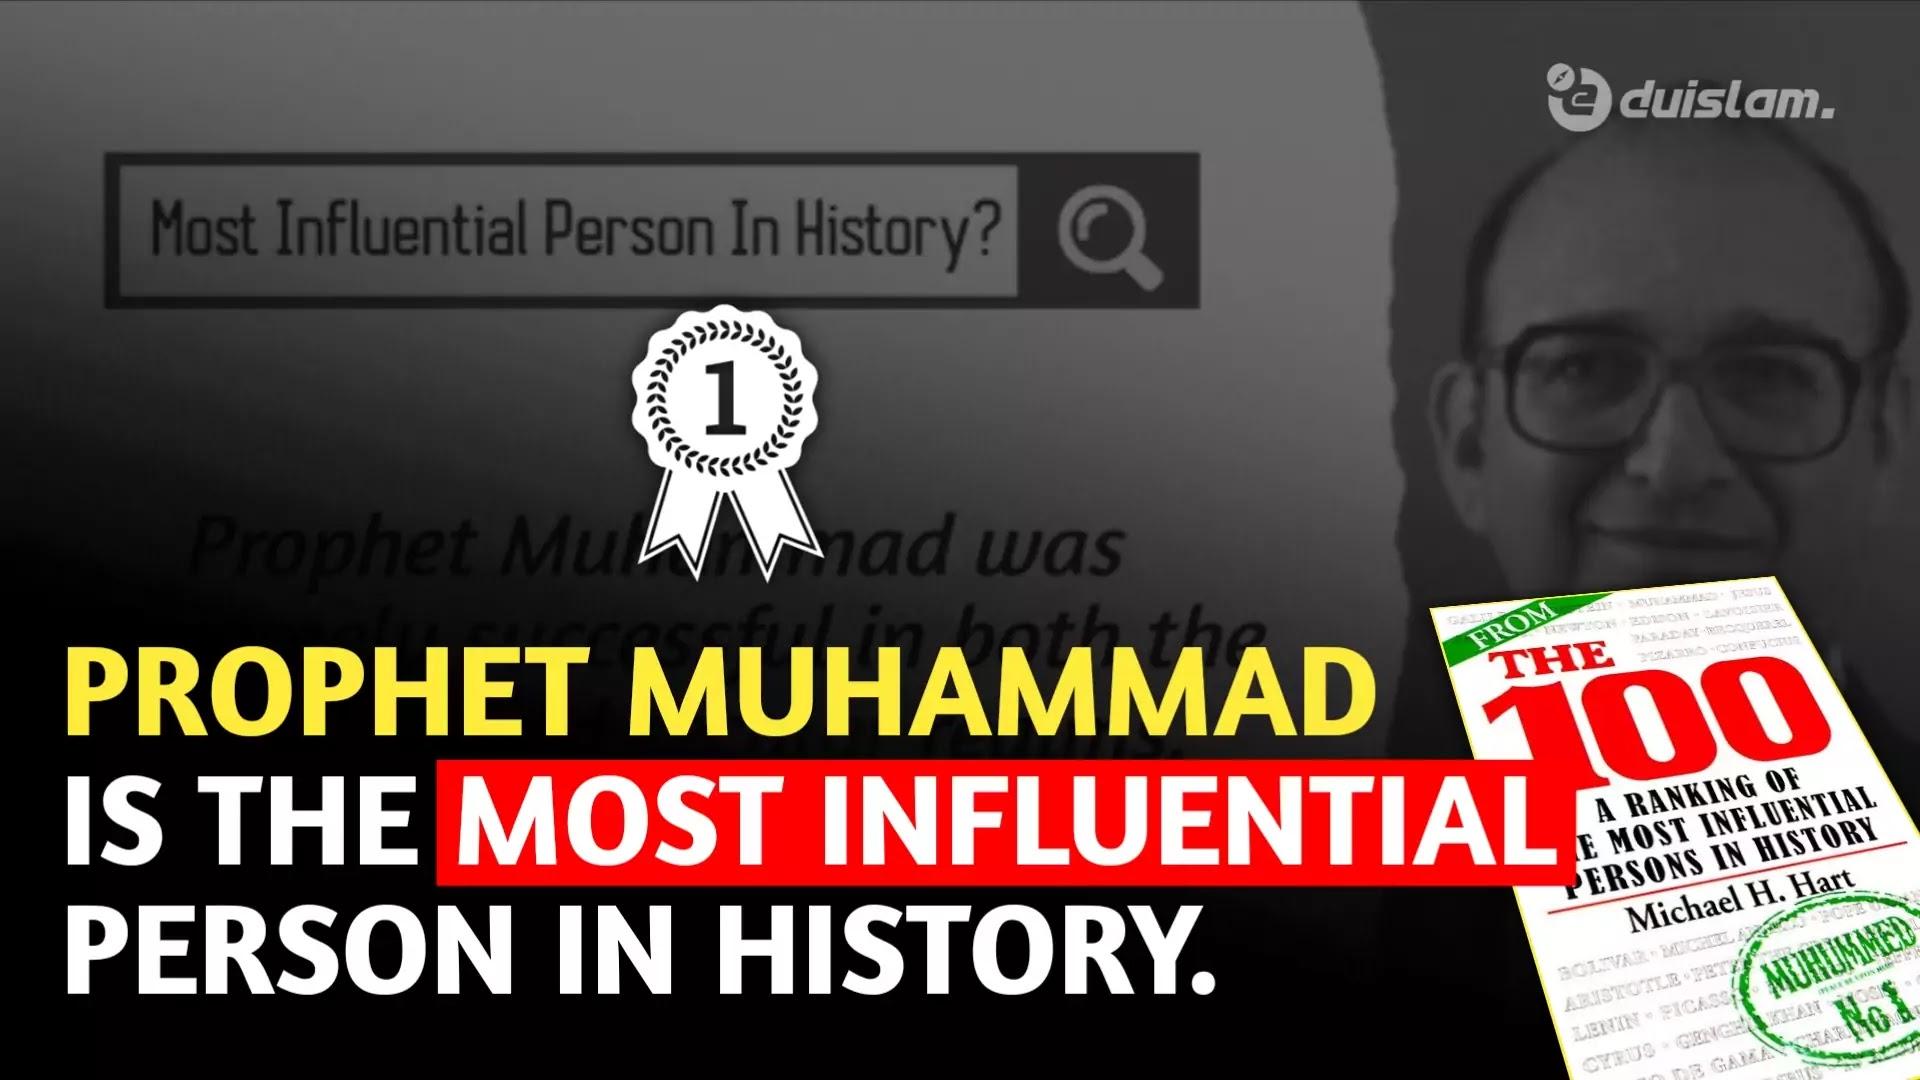 Michael Hart about Prophet Muhammad